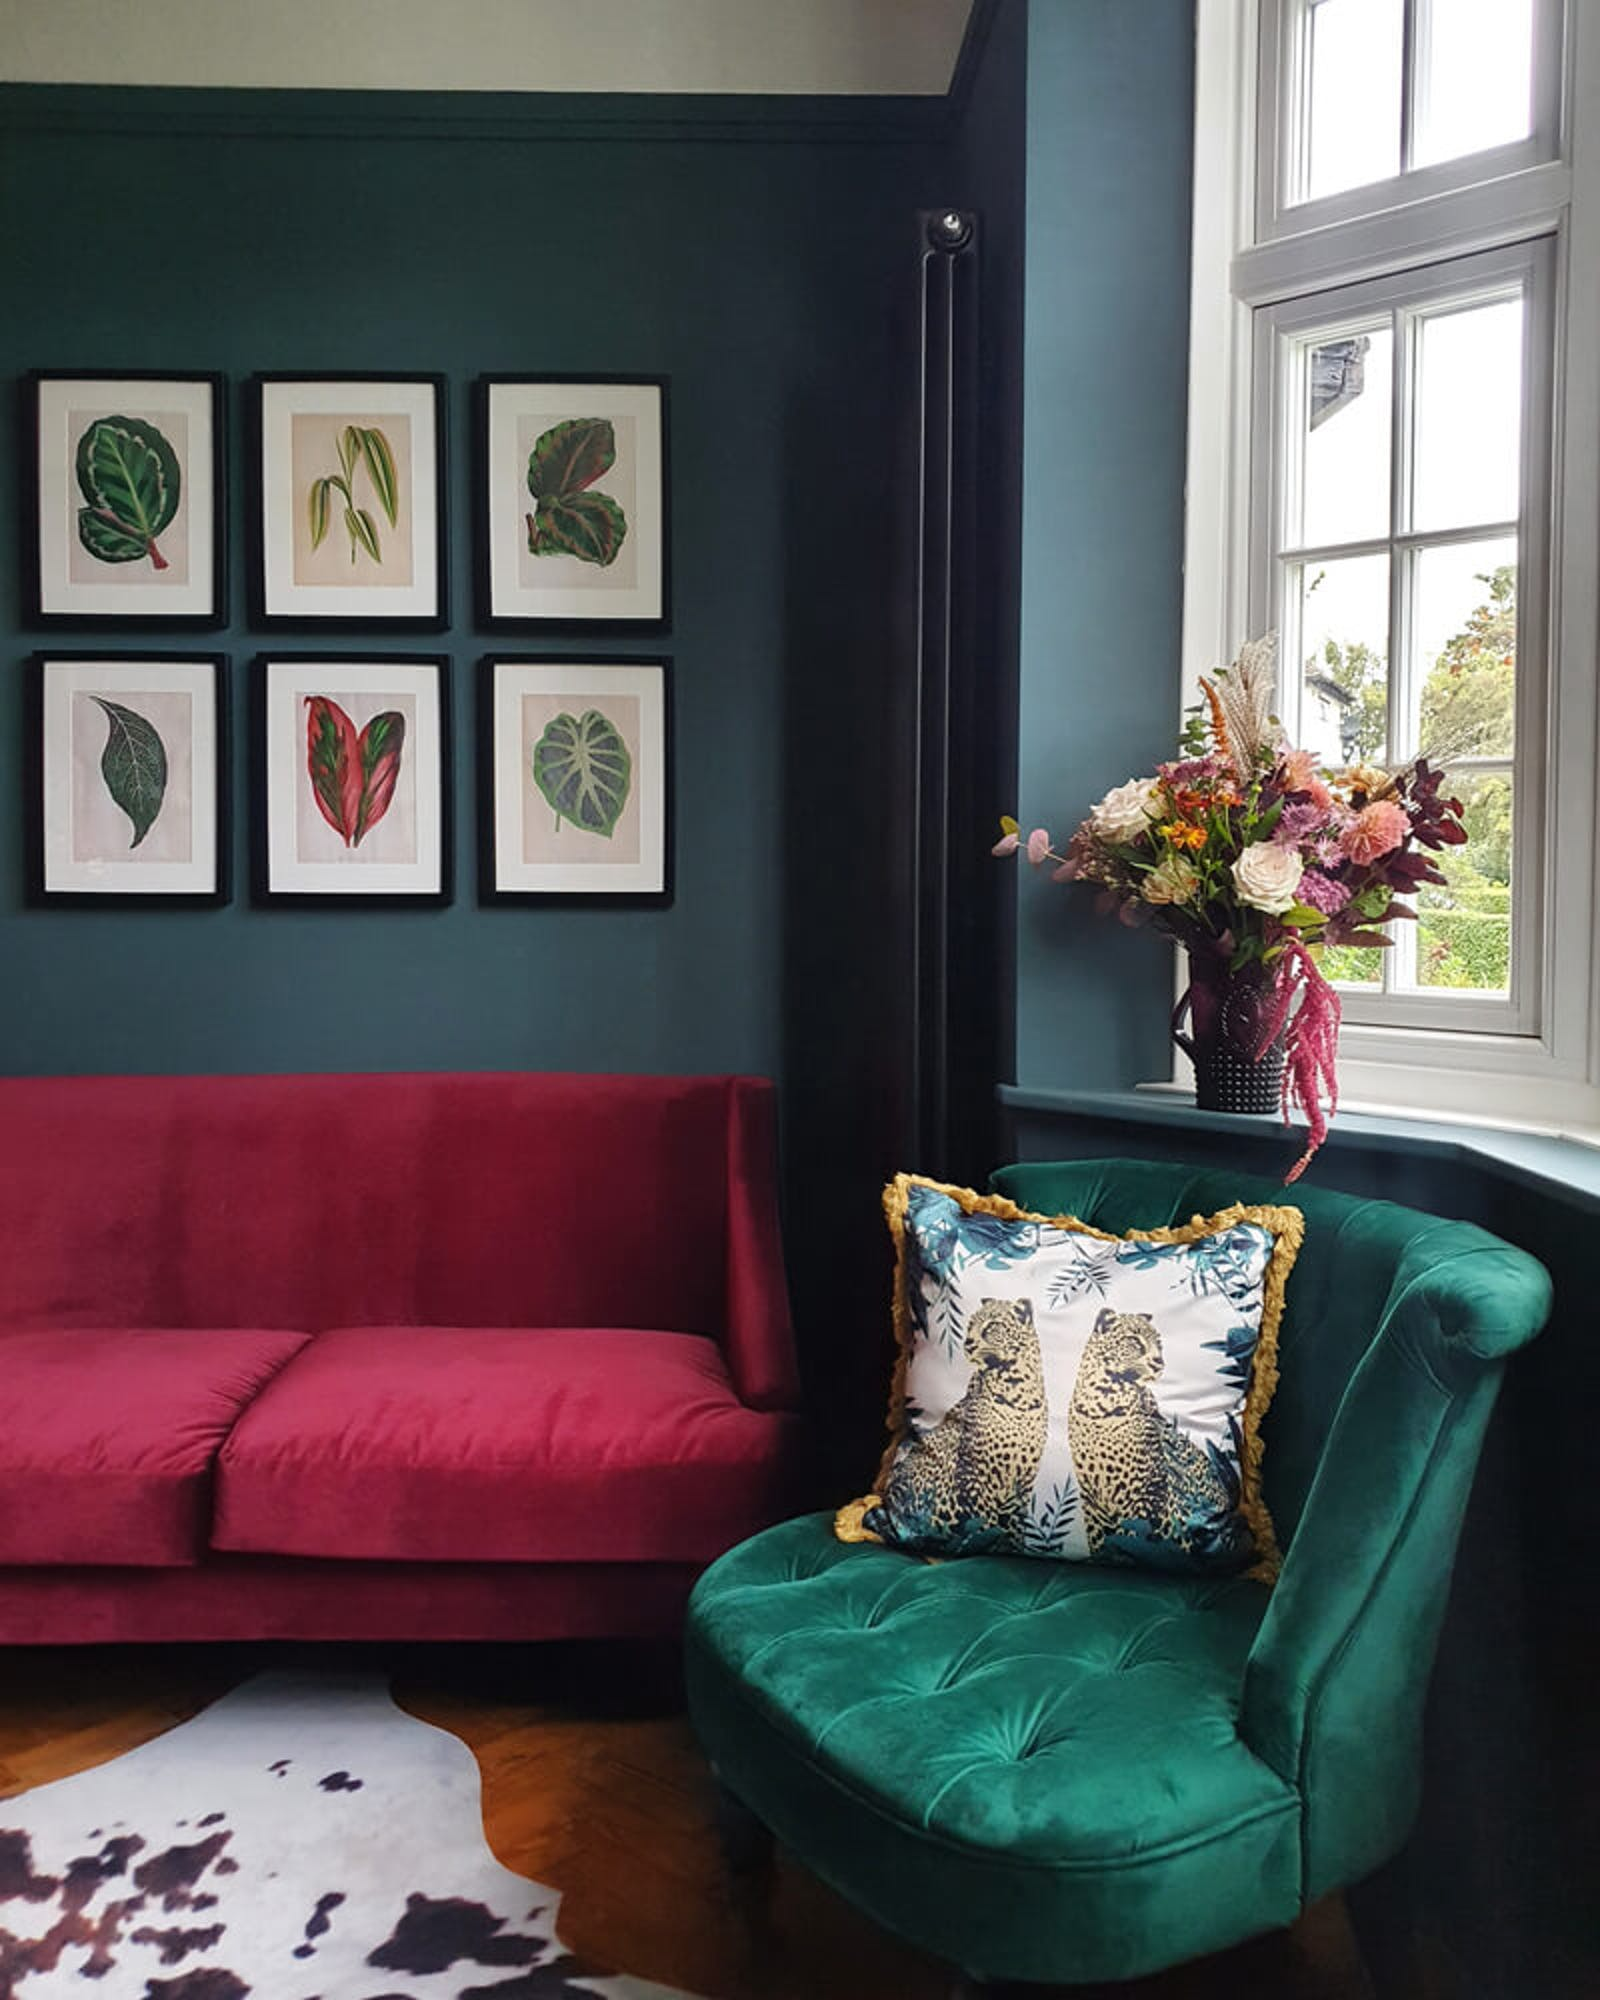 Living room with velvet sofas and dark green walls